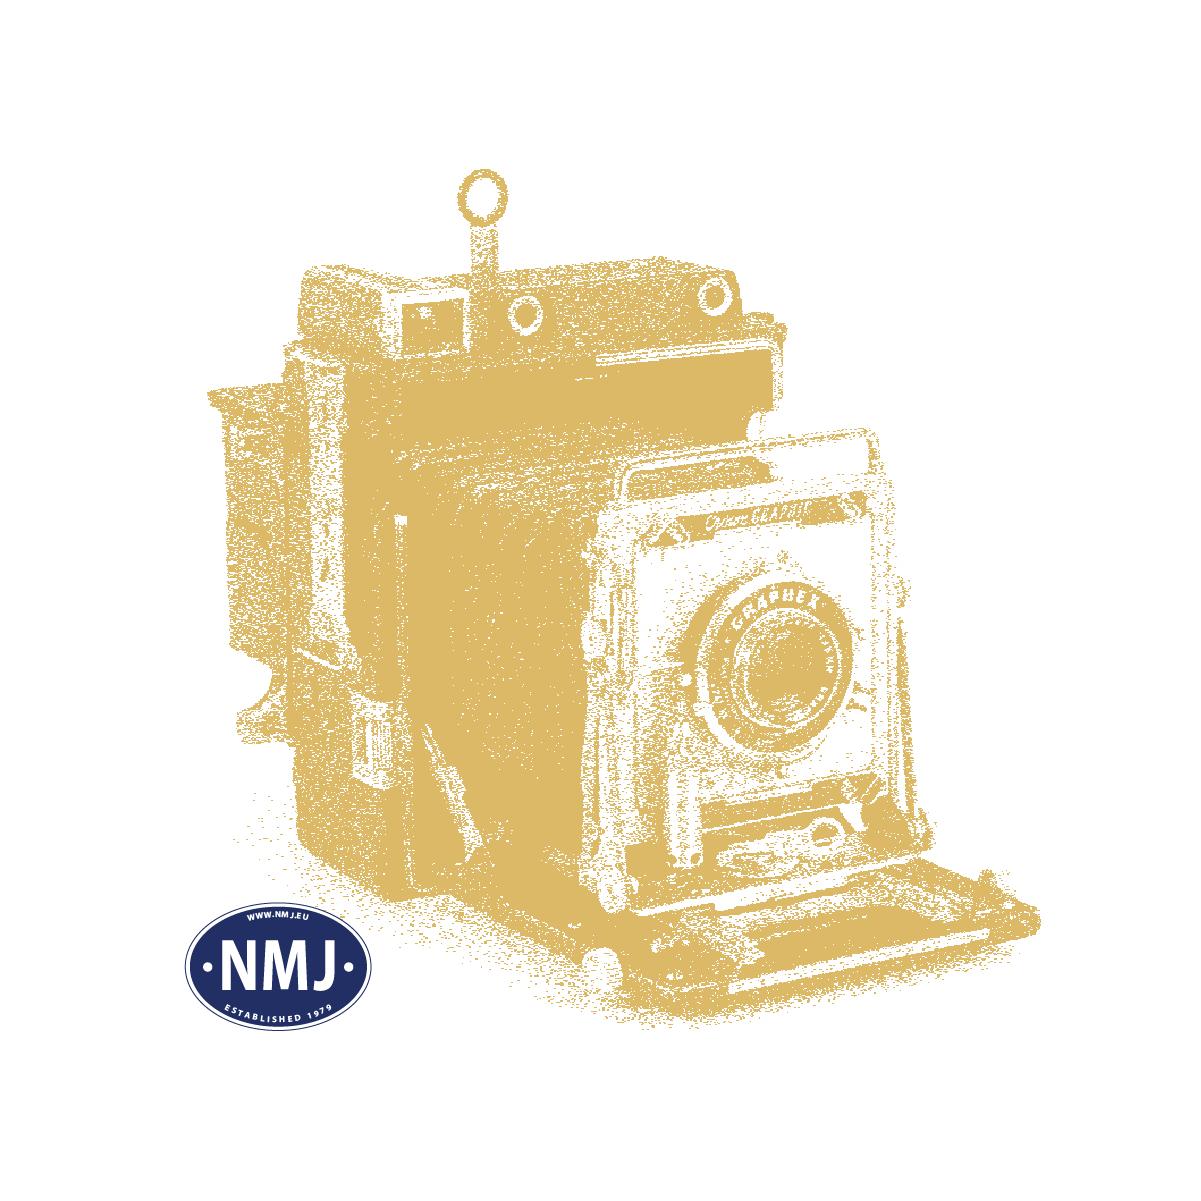 NMJST34238 - NMJ Superline NSB T3 4238 Stakevogn m/ Bremseplattform